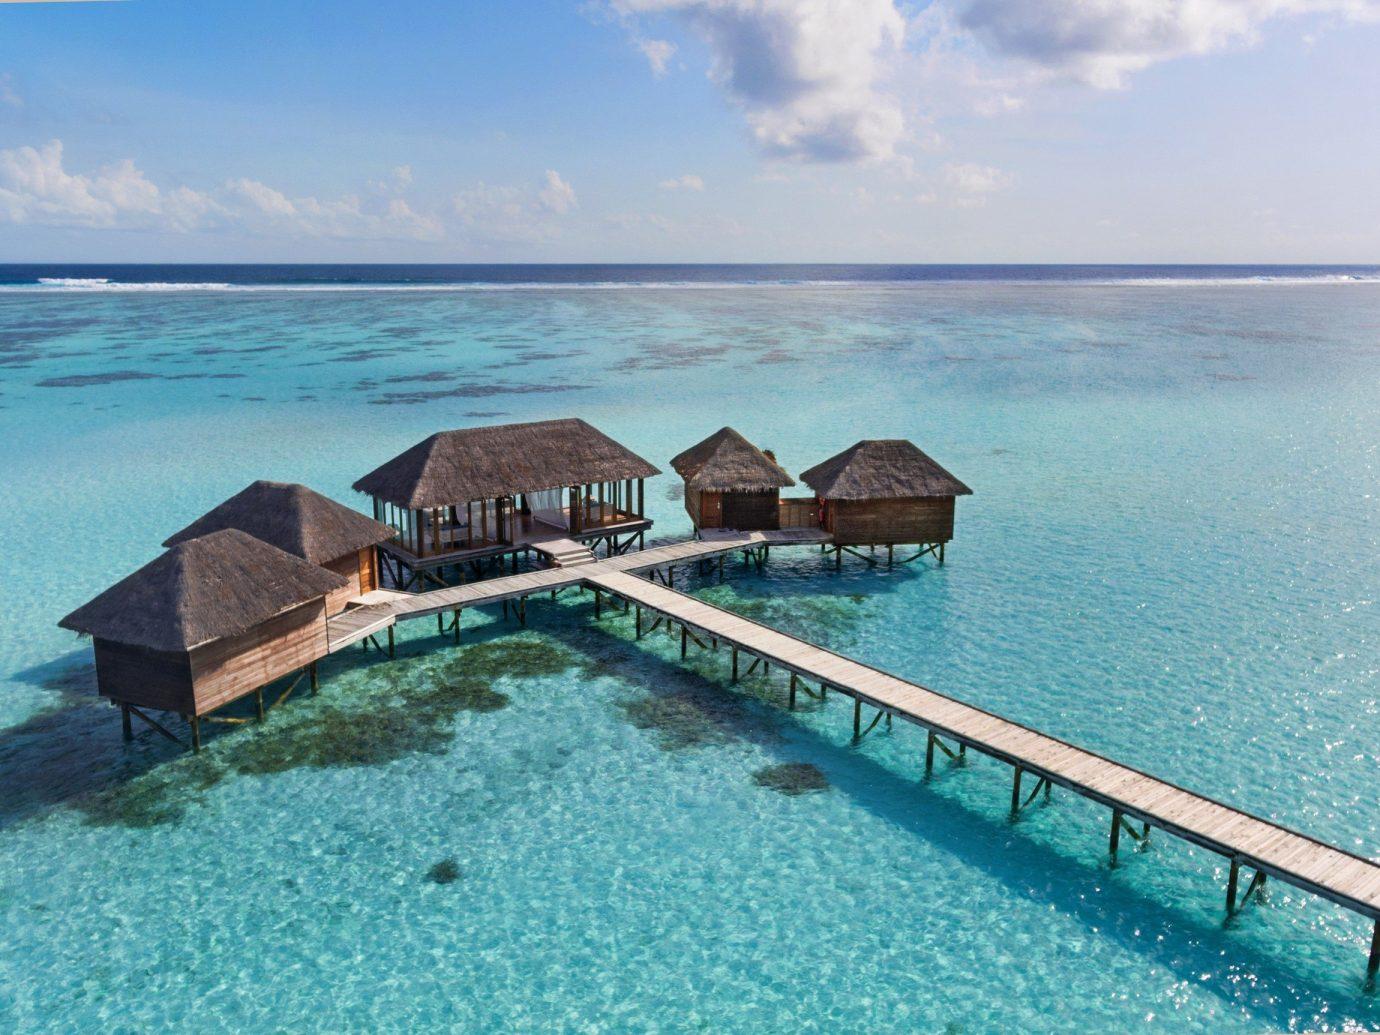 asia Beach Hotels Islands Maldives News Sea coastal and oceanic landforms Ocean Island Lagoon vacation swimming pool caribbean tropics islet sky Resort Coast tourism bay